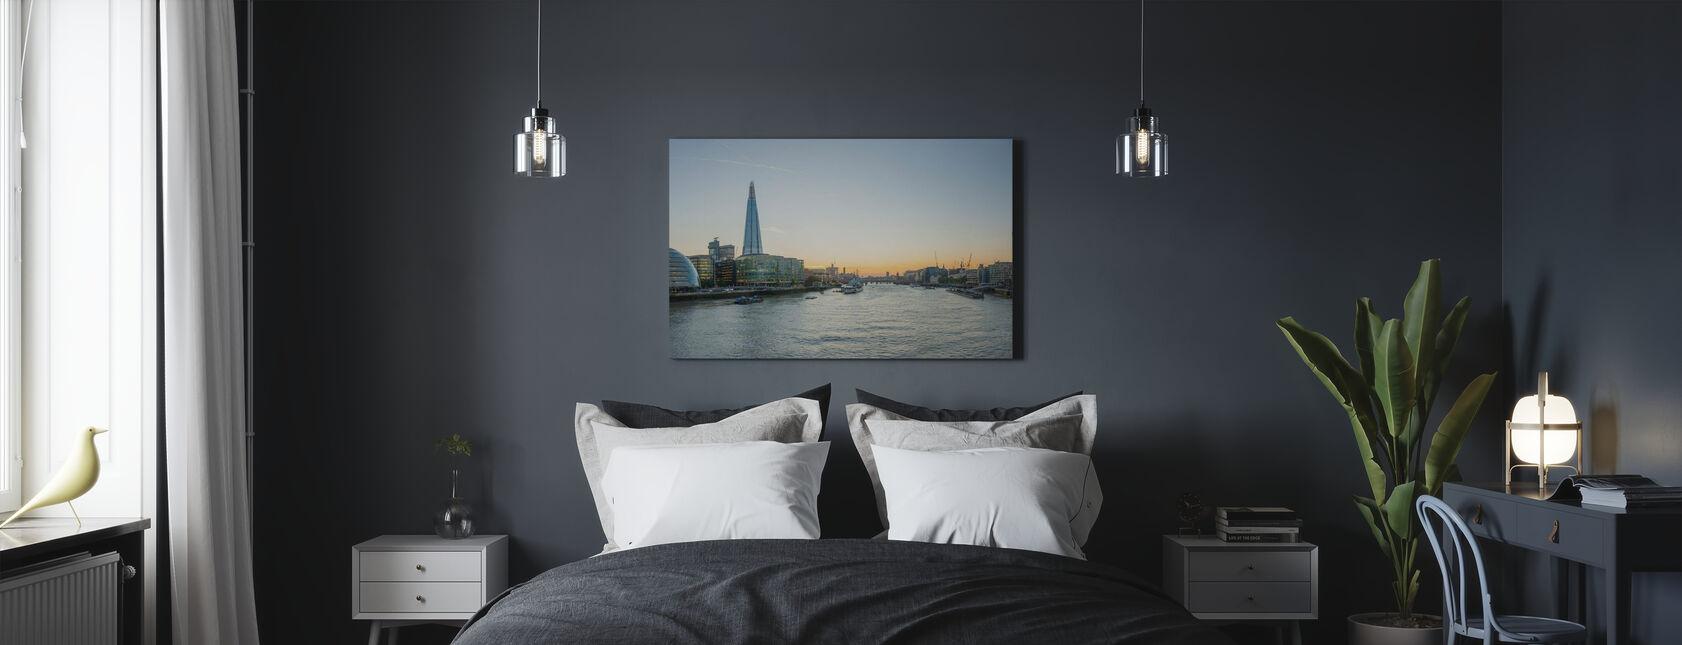 London Cityscape - Canvas print - Bedroom